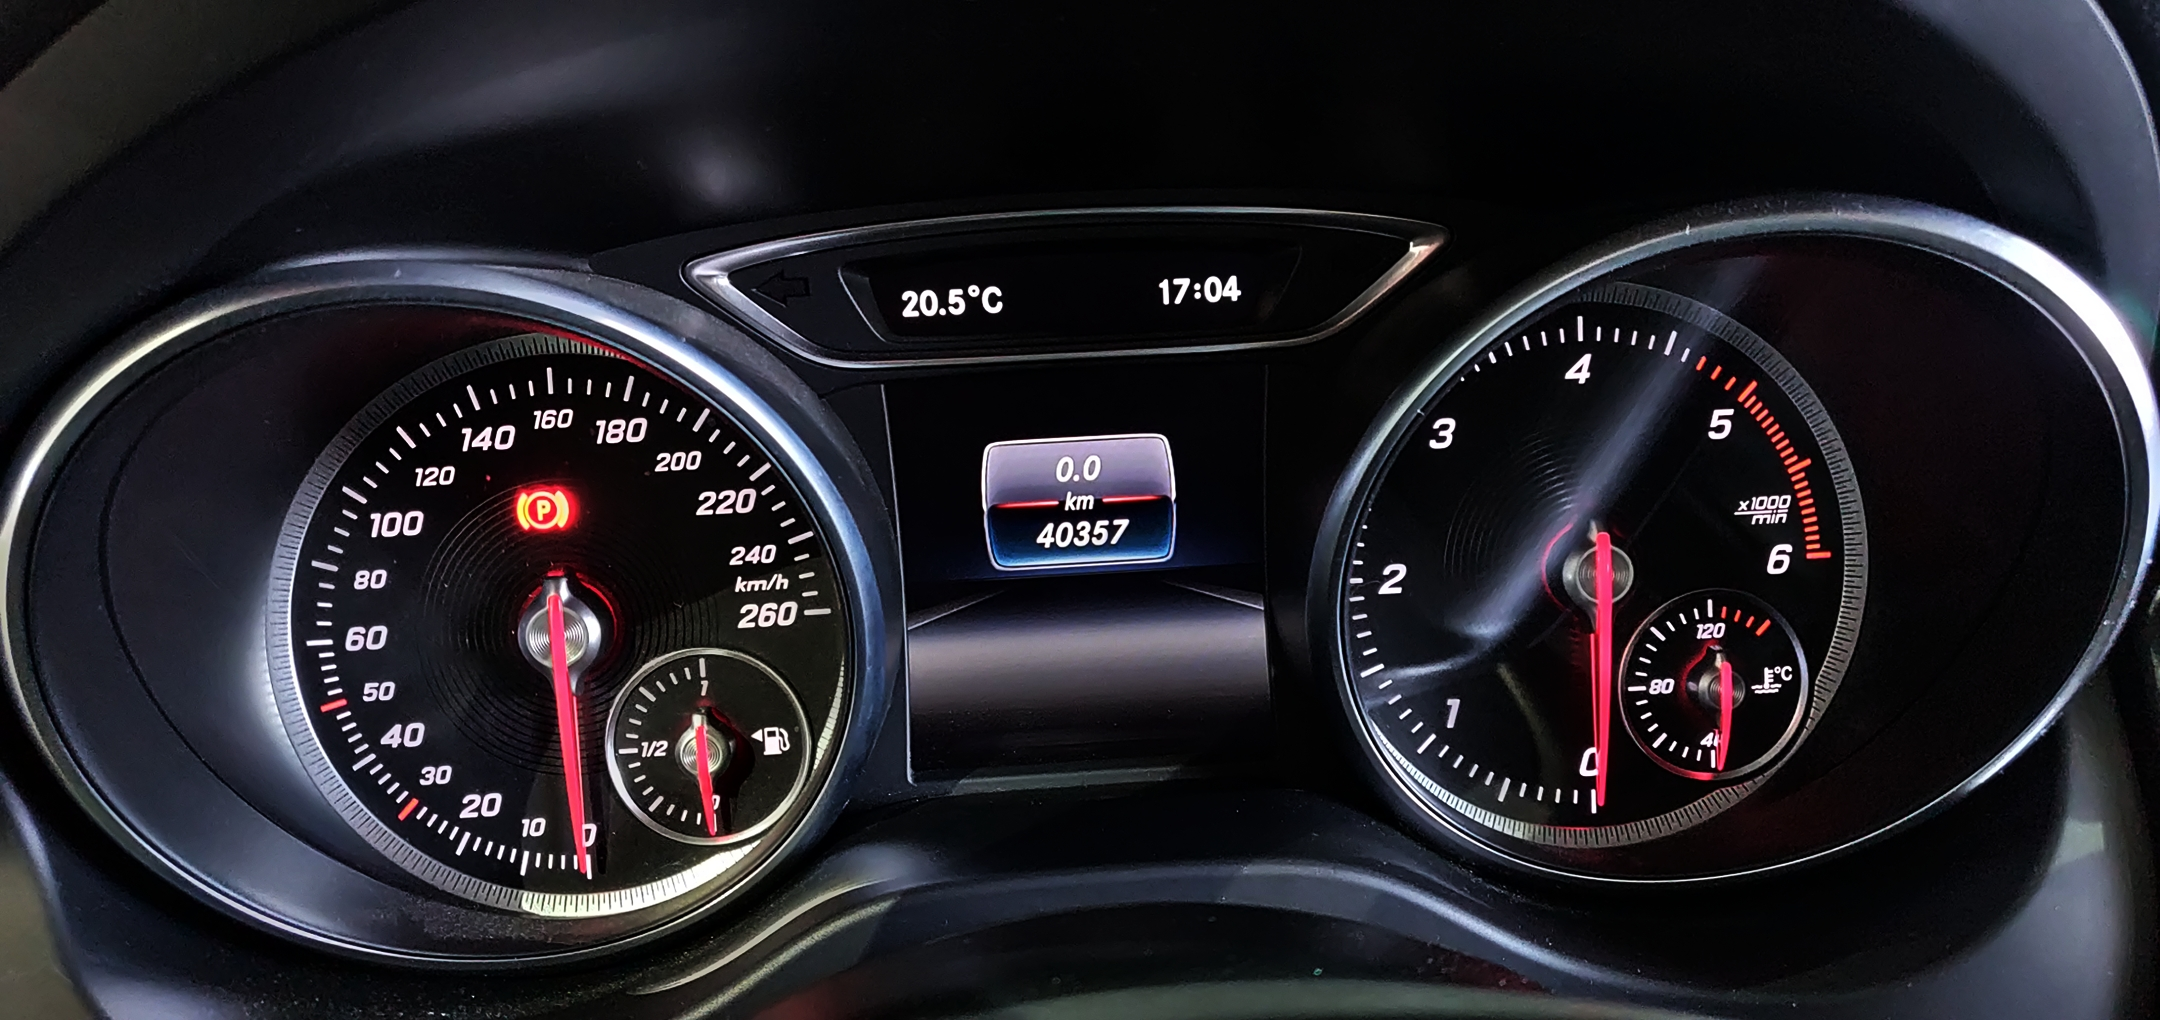 Mercedes-Benz CLA 180 1.5 Style | Imagem 12